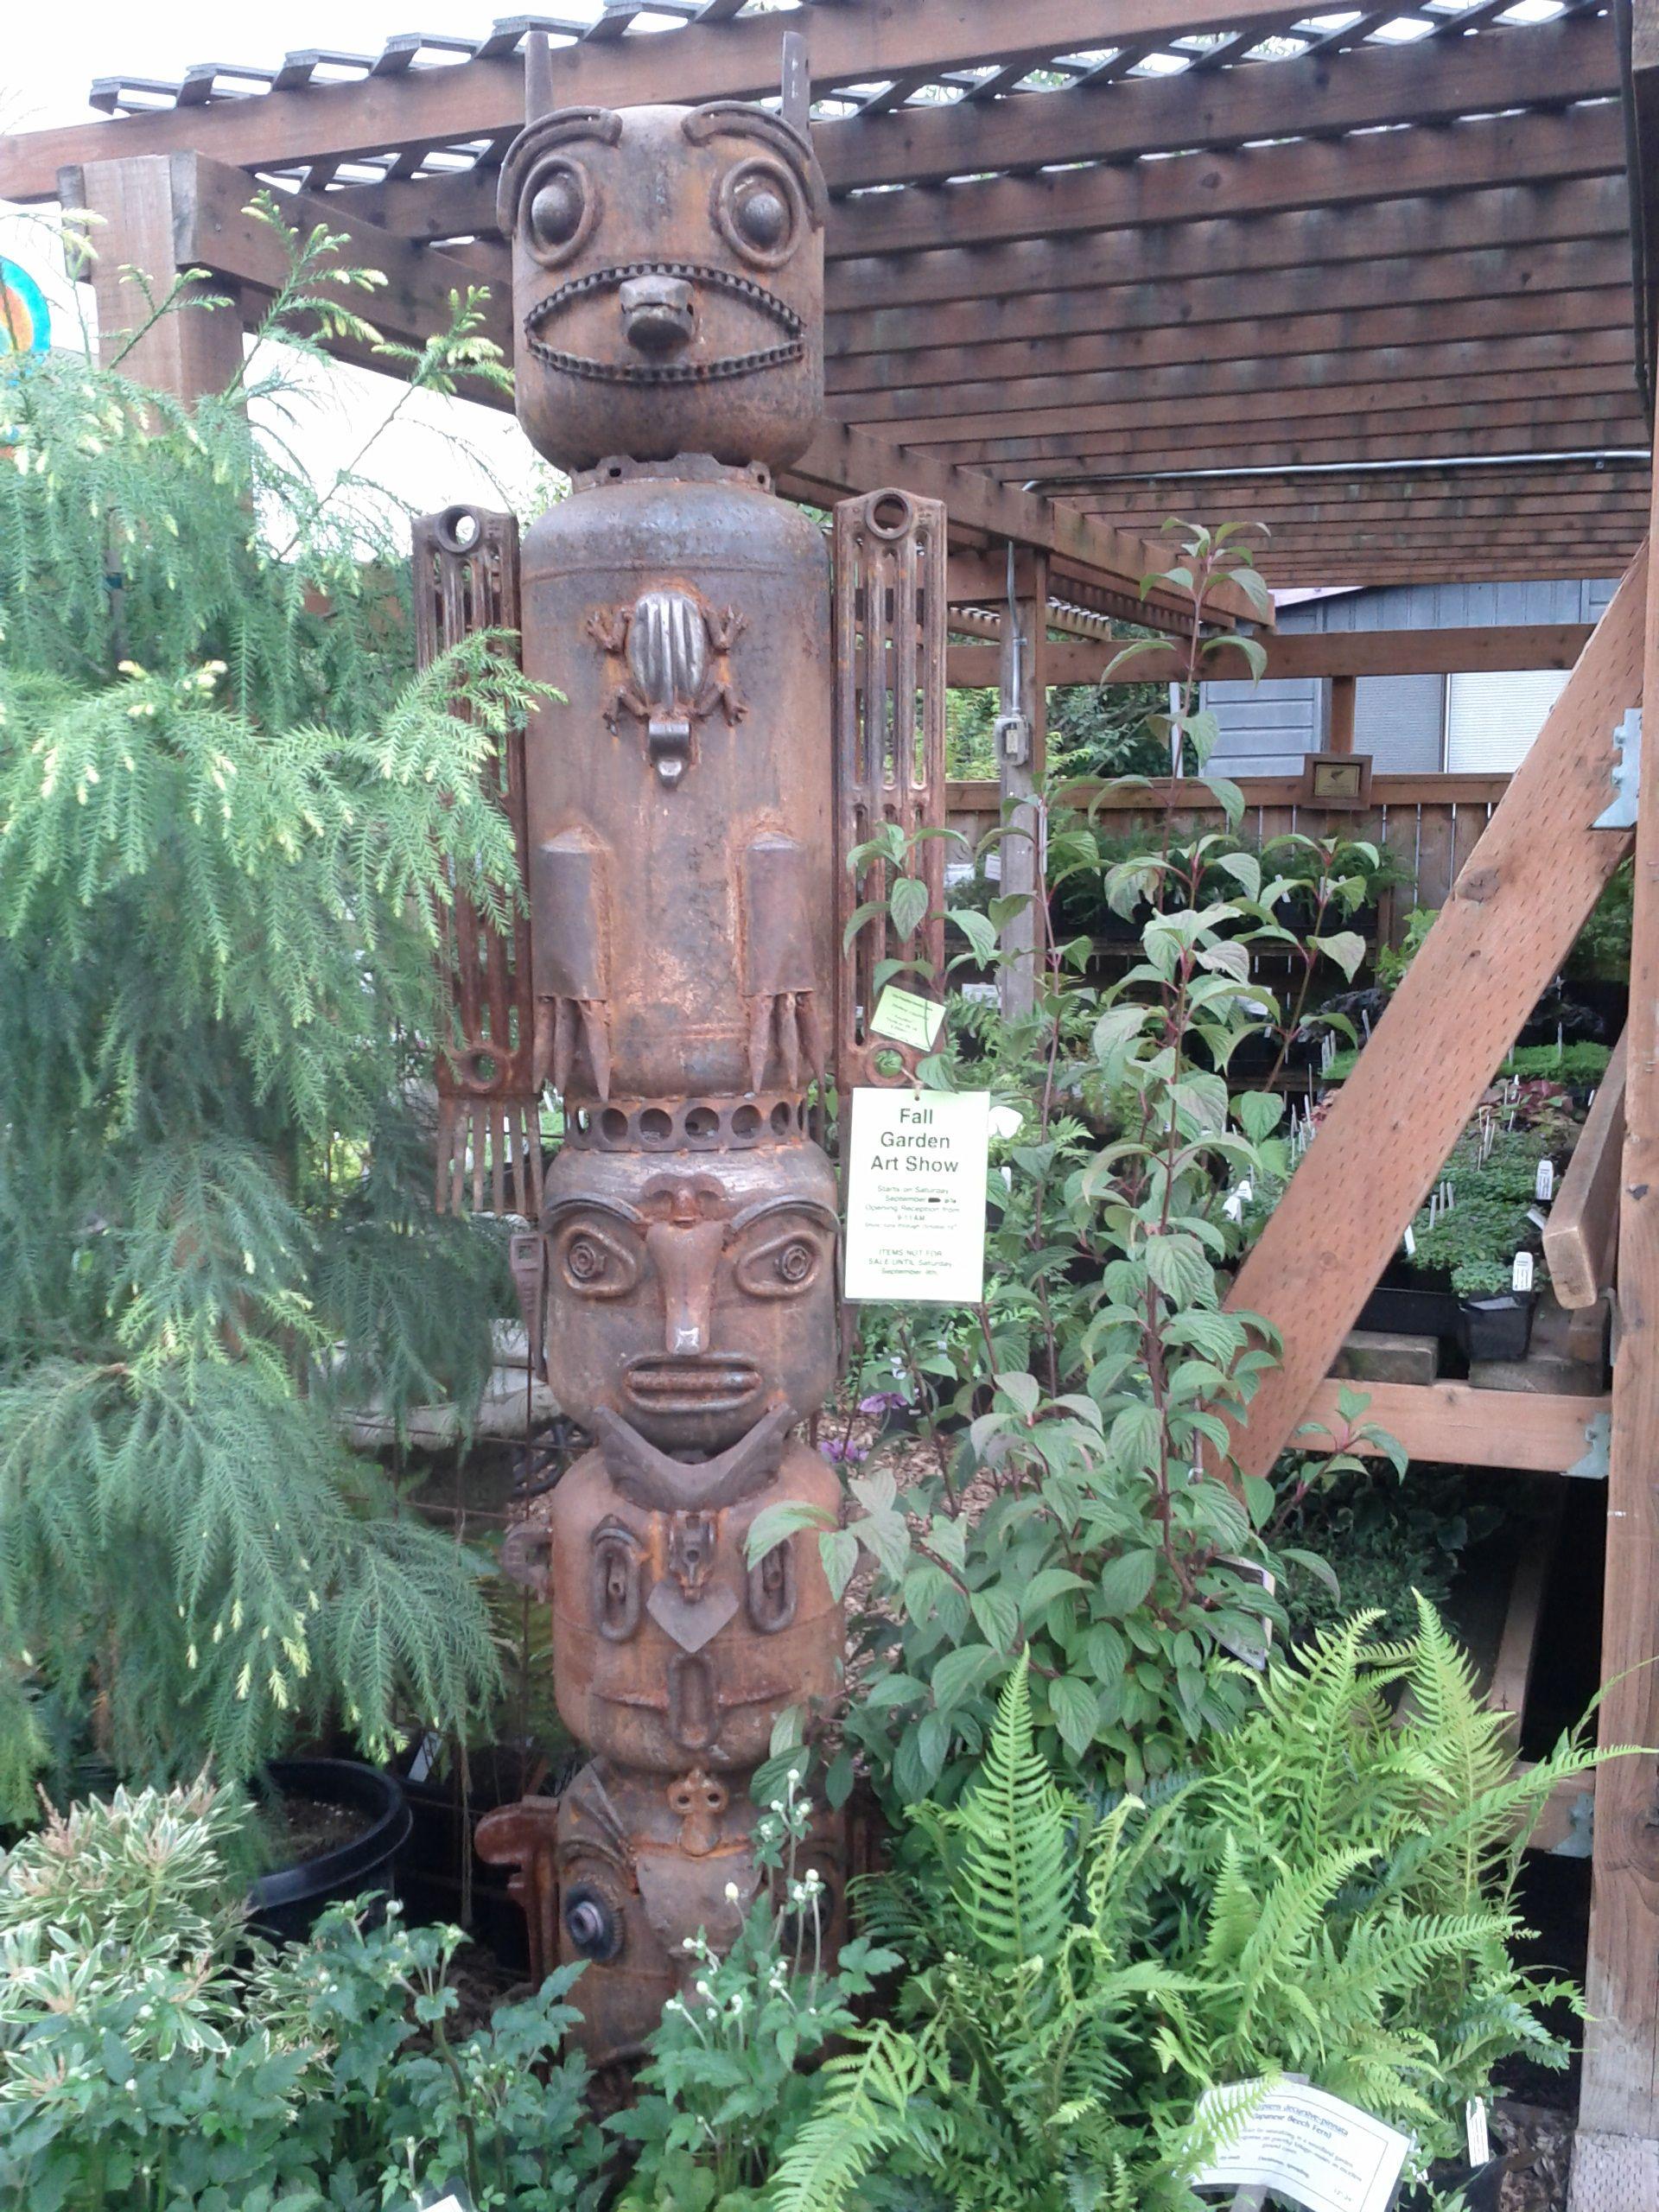 Denny croston garden totem scrap metal art garden totem